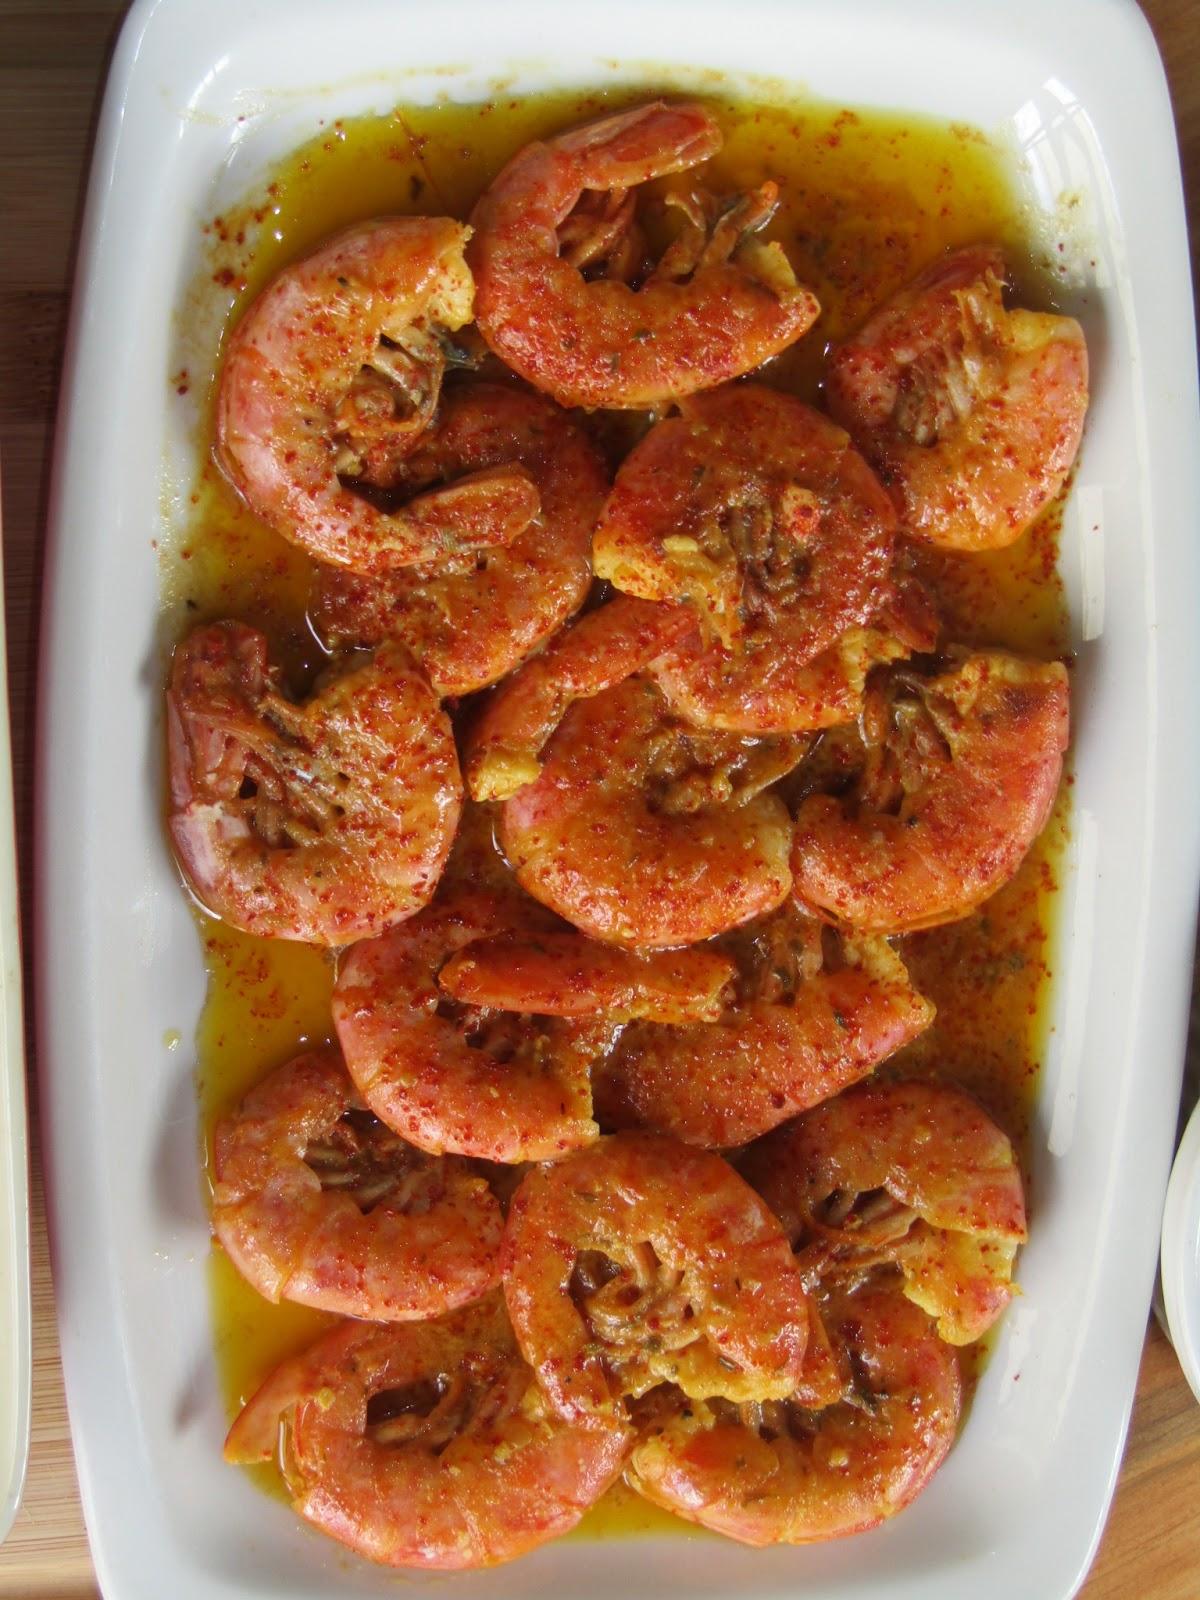 Watch Cauliflower Shells In Cheddar Sauce video